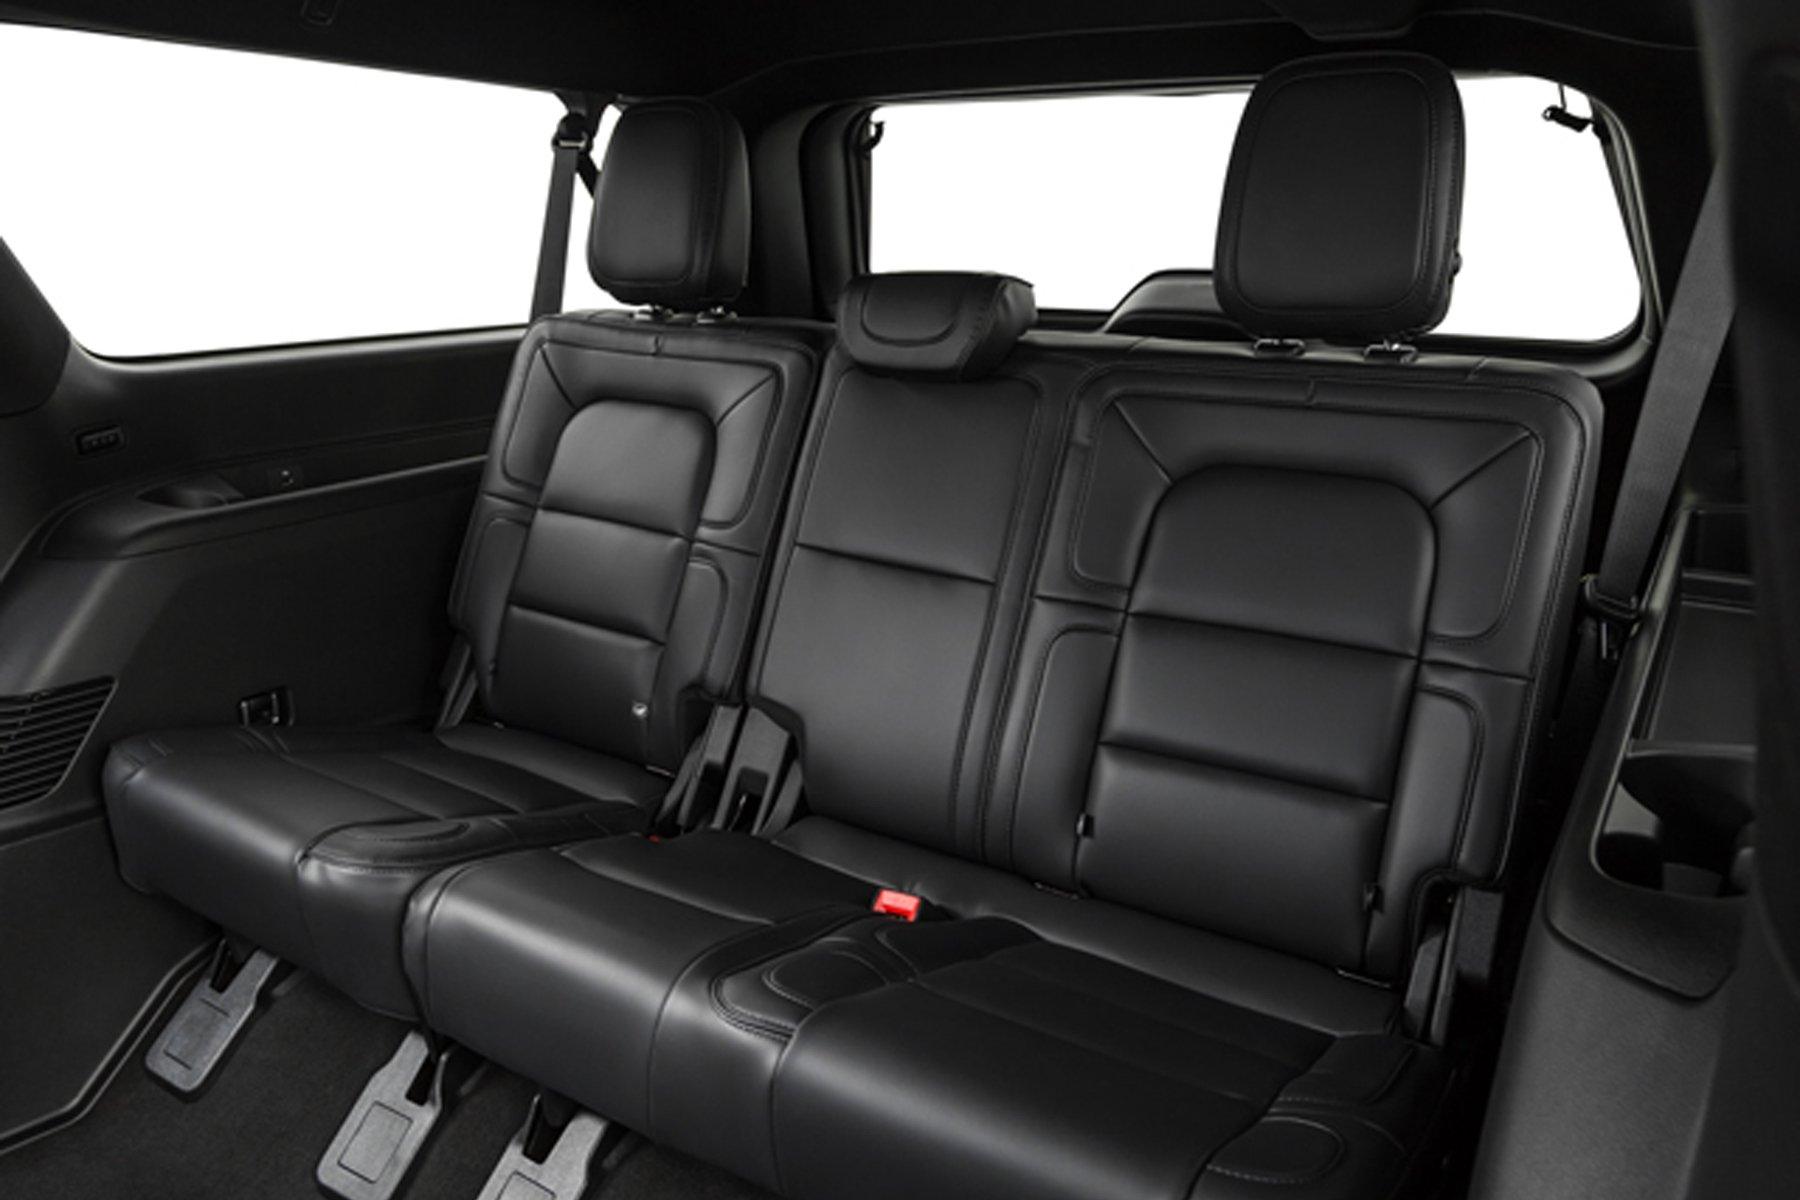 Skyline Chicago Limo Cars Luxury Fleet Black Lincoln Navigator Interior Rear Seats October 2020